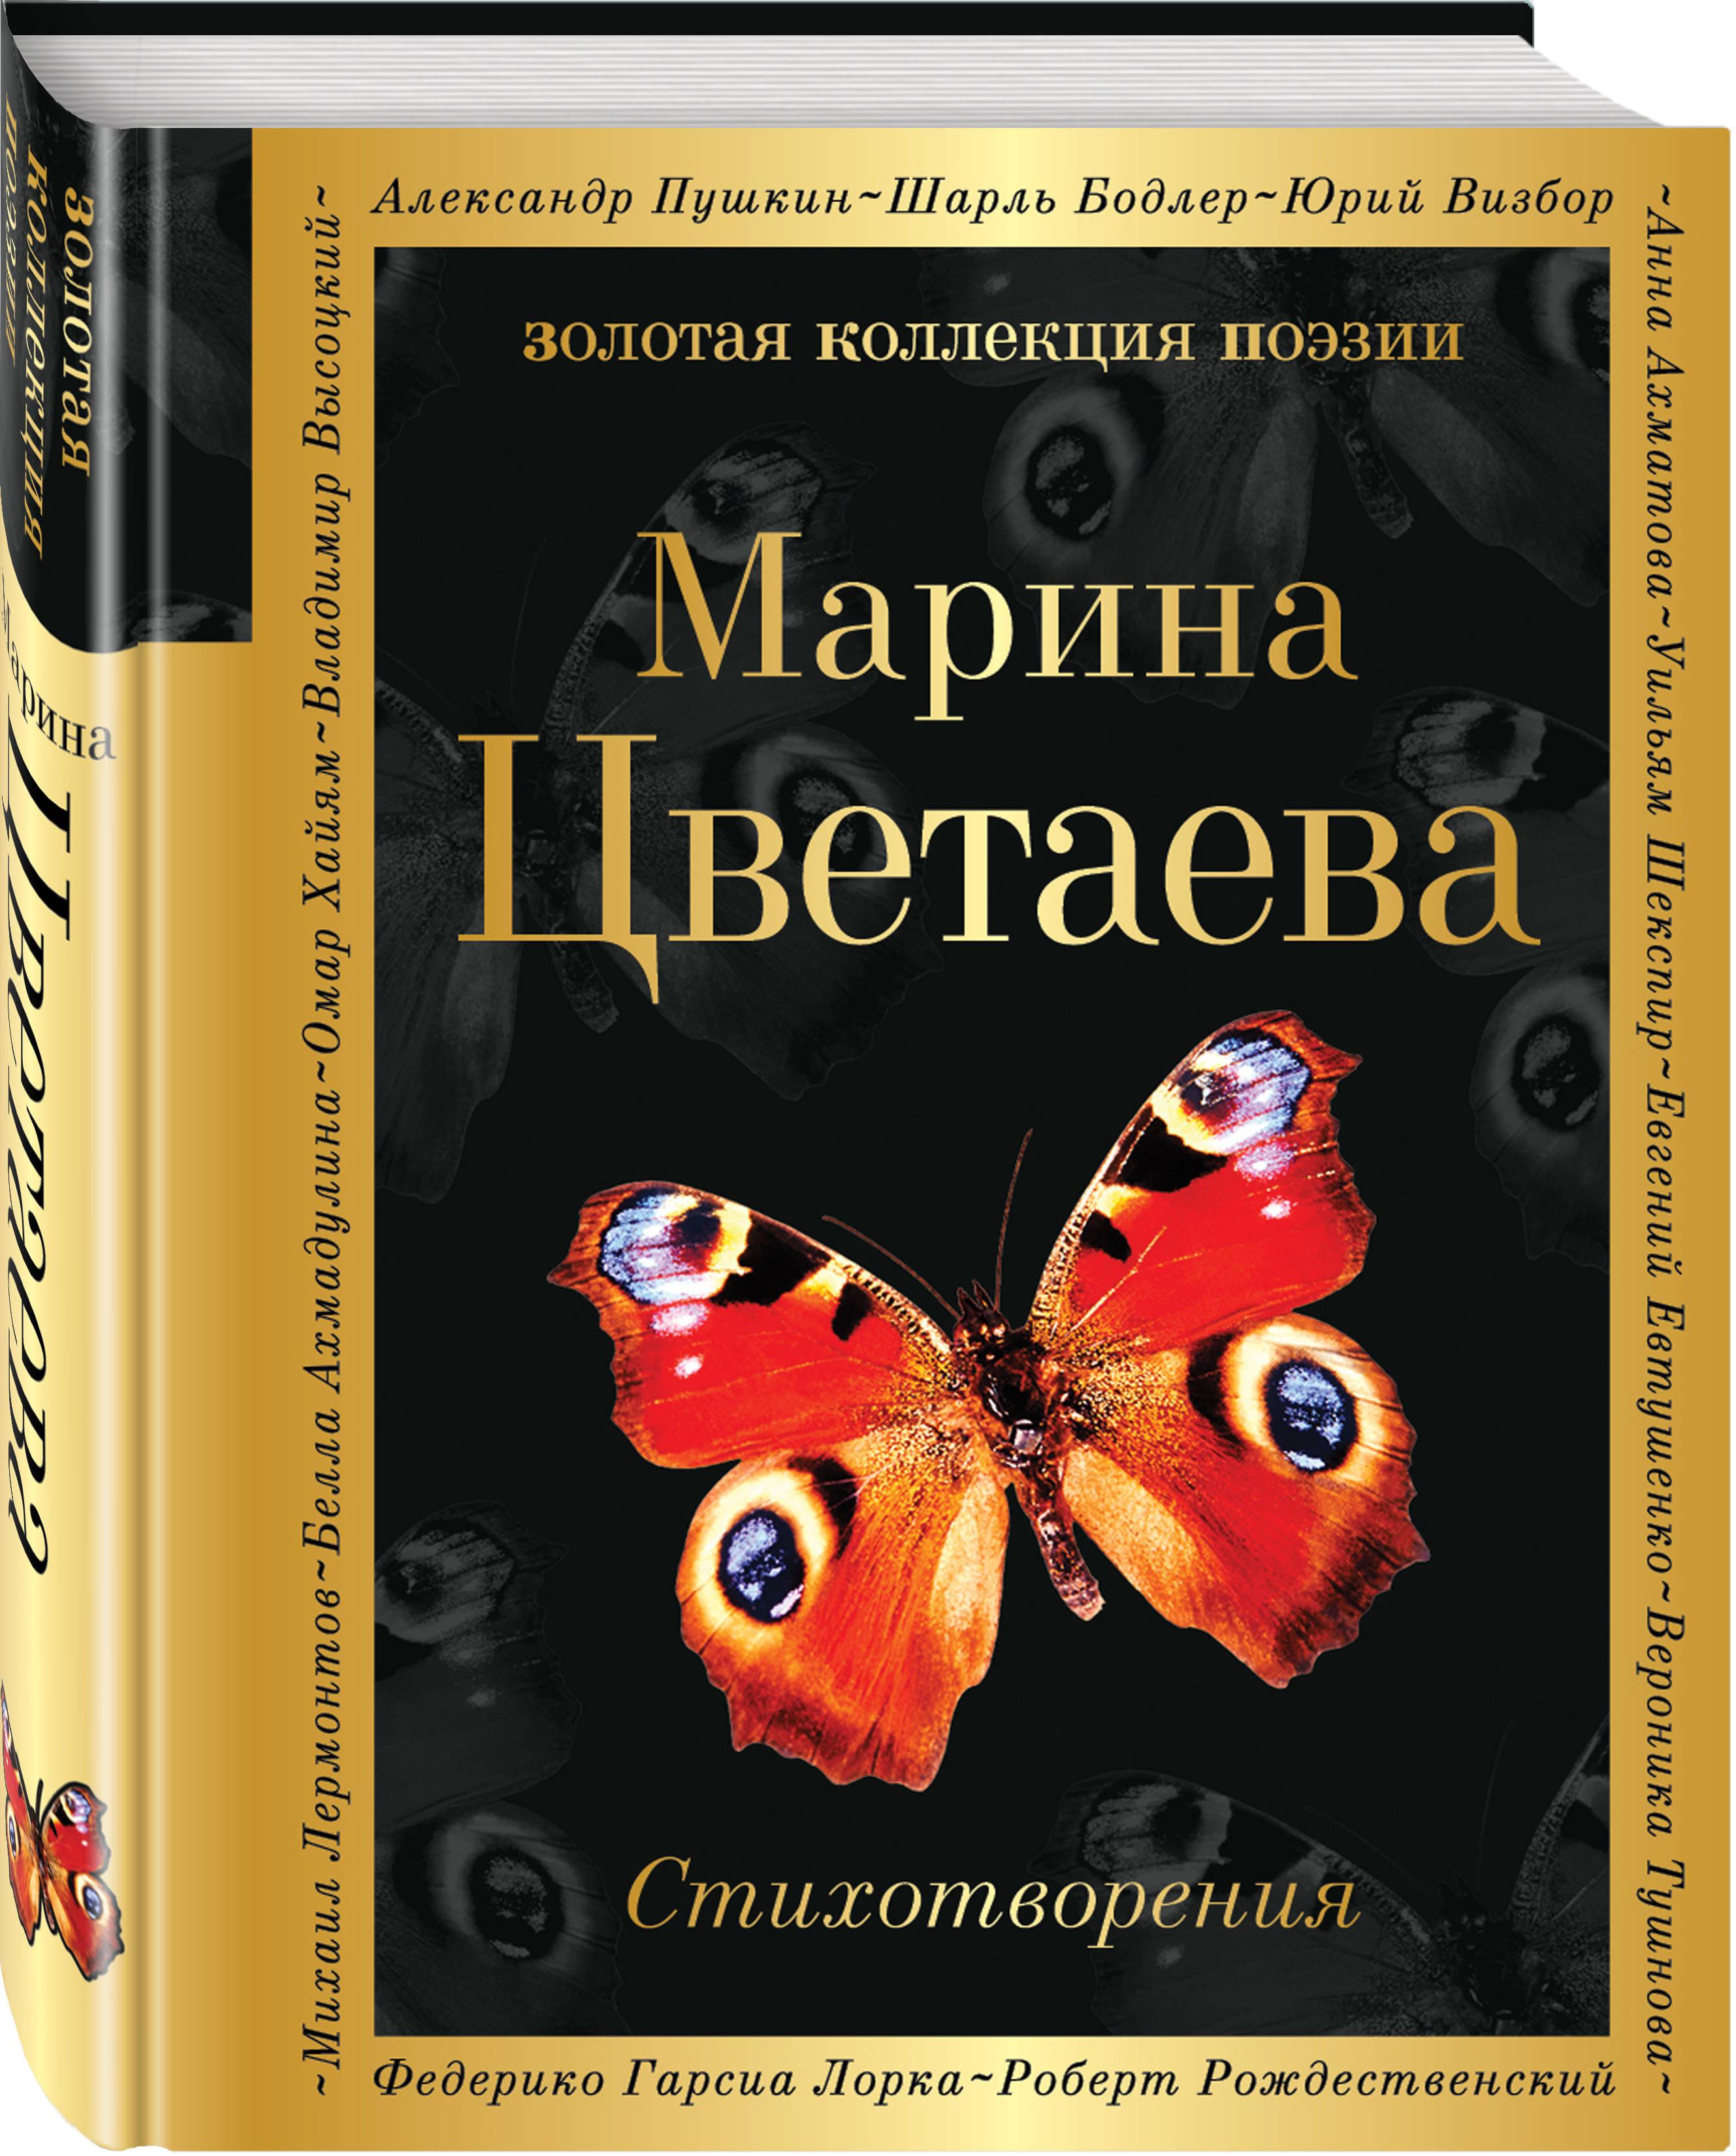 Марина Цветаева Стихотворения марина цветаева марина цветаева стихотворения поэмы проза